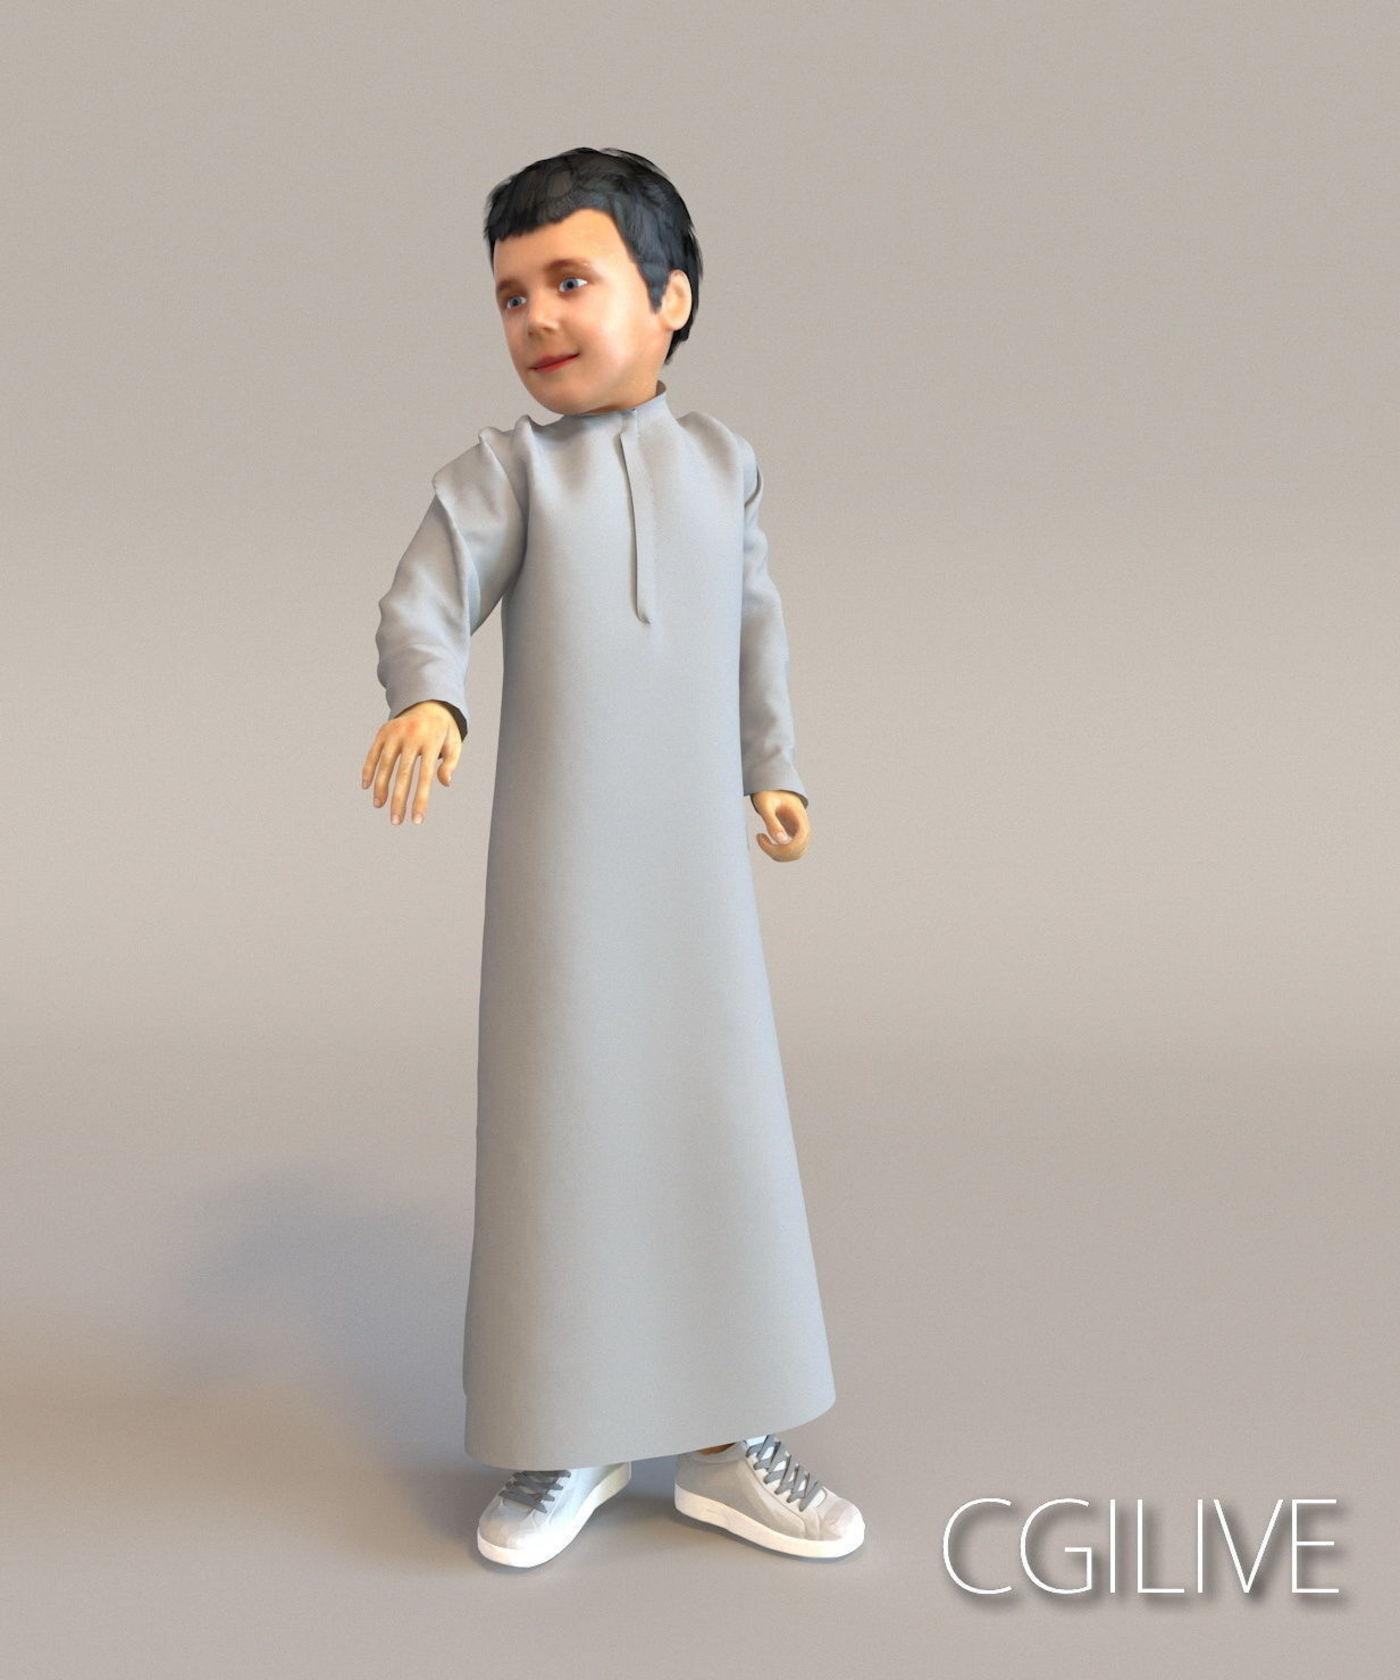 1x Arabic real cloth loop animated boy for testing